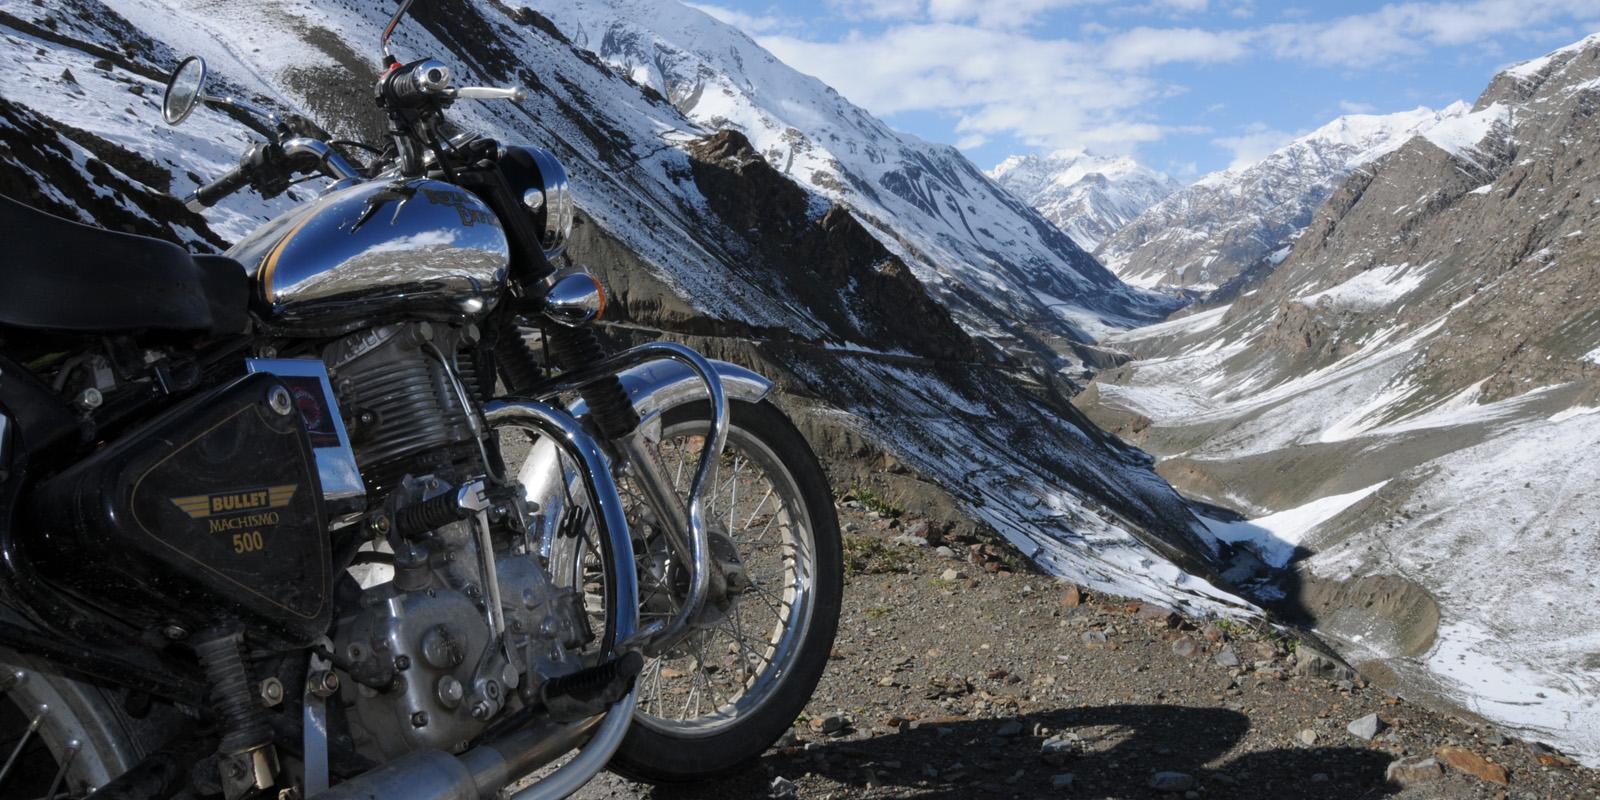 Moto Royal Enfield sur la route Manali Leh - Voyage moto Inde Himalaya